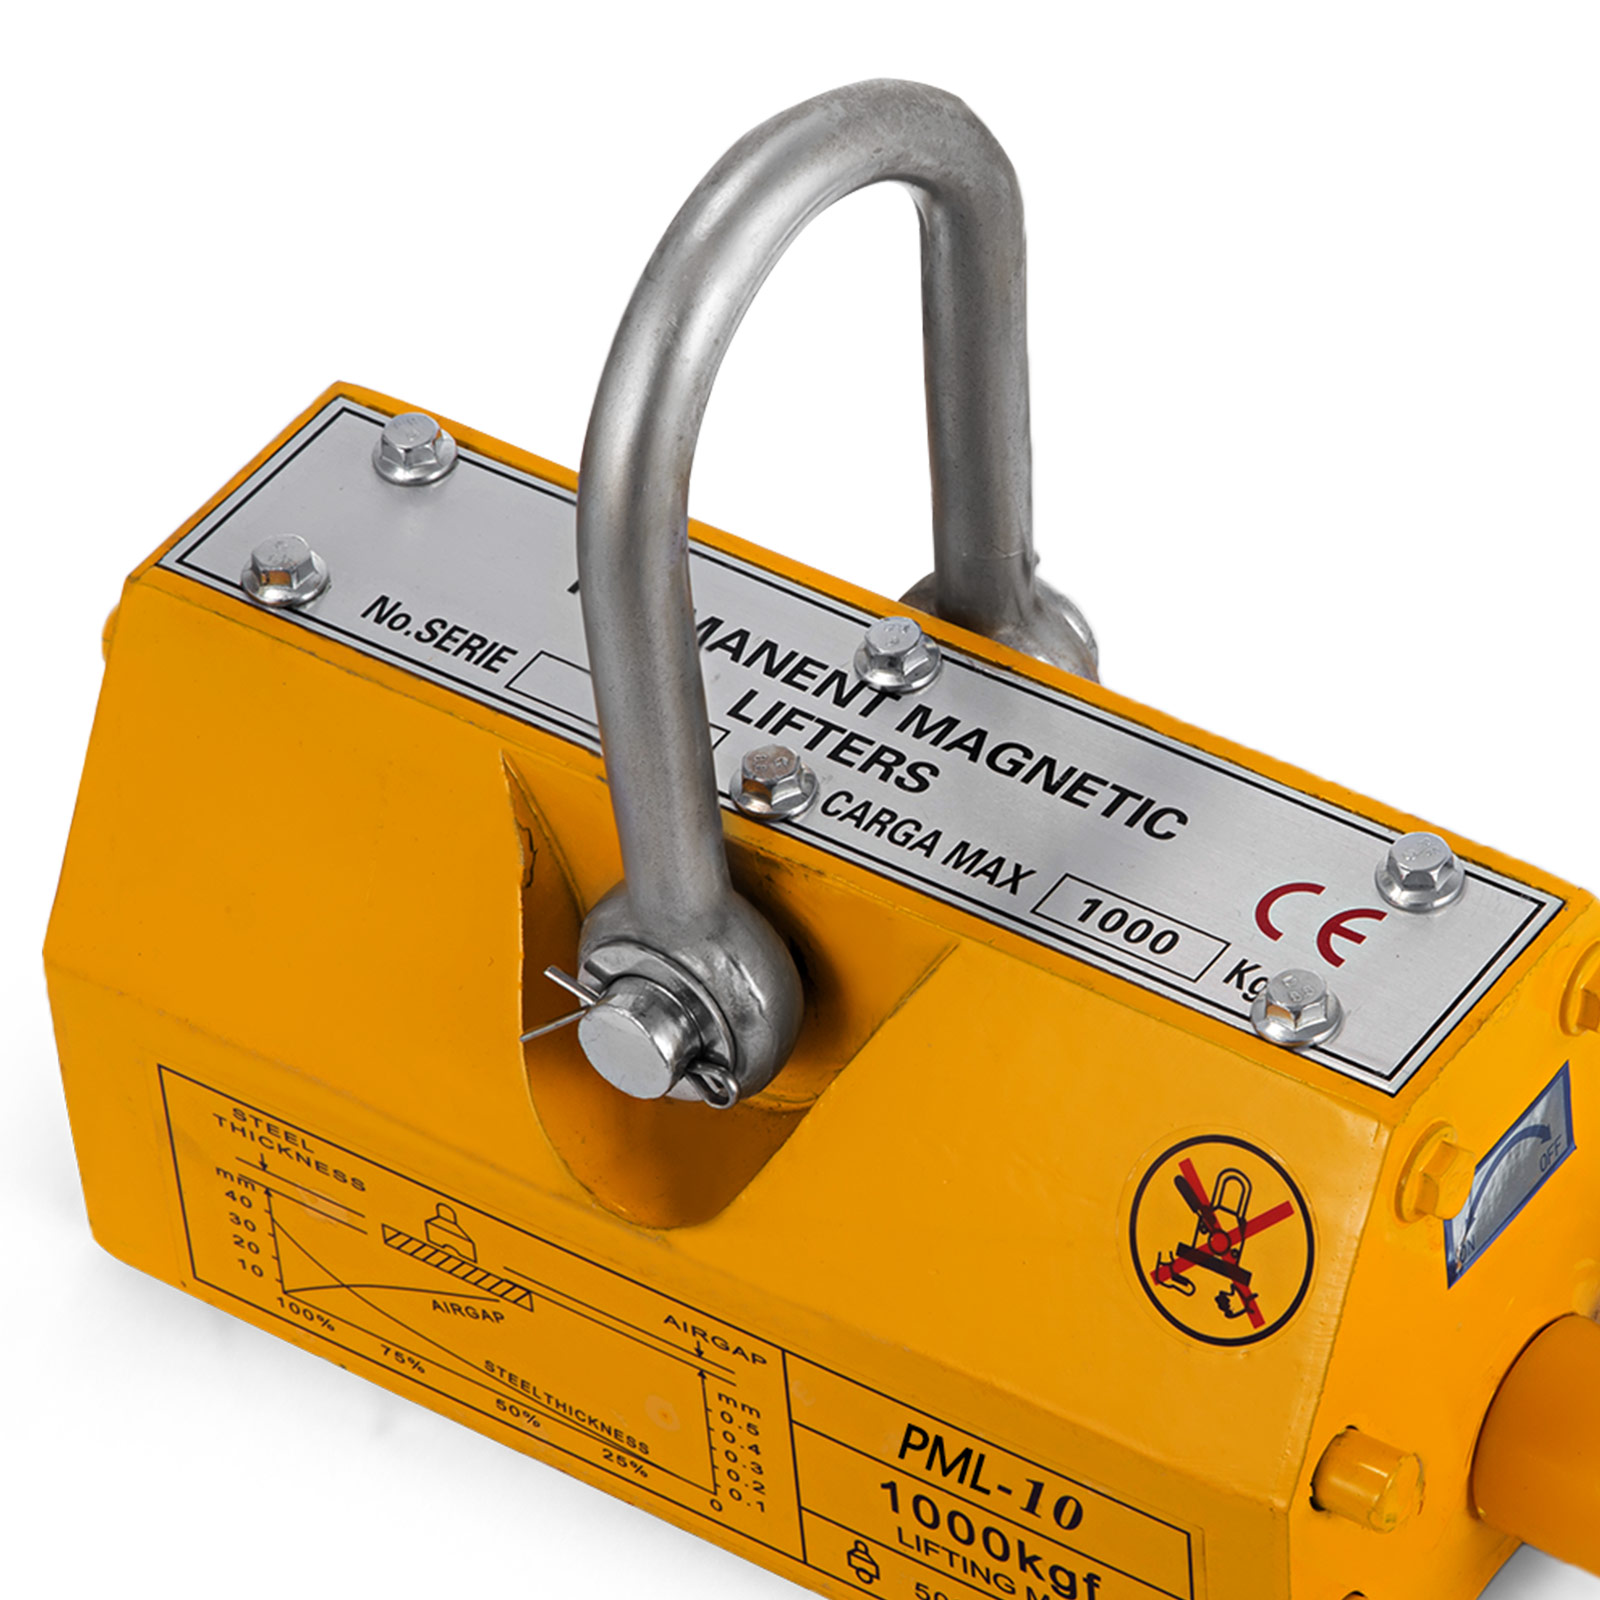 100-300-600-1000KG-Steel-Magnetic-Lifter-Heavy-Duty-Crane-Hoist-Lifting-Magnet miniature 70